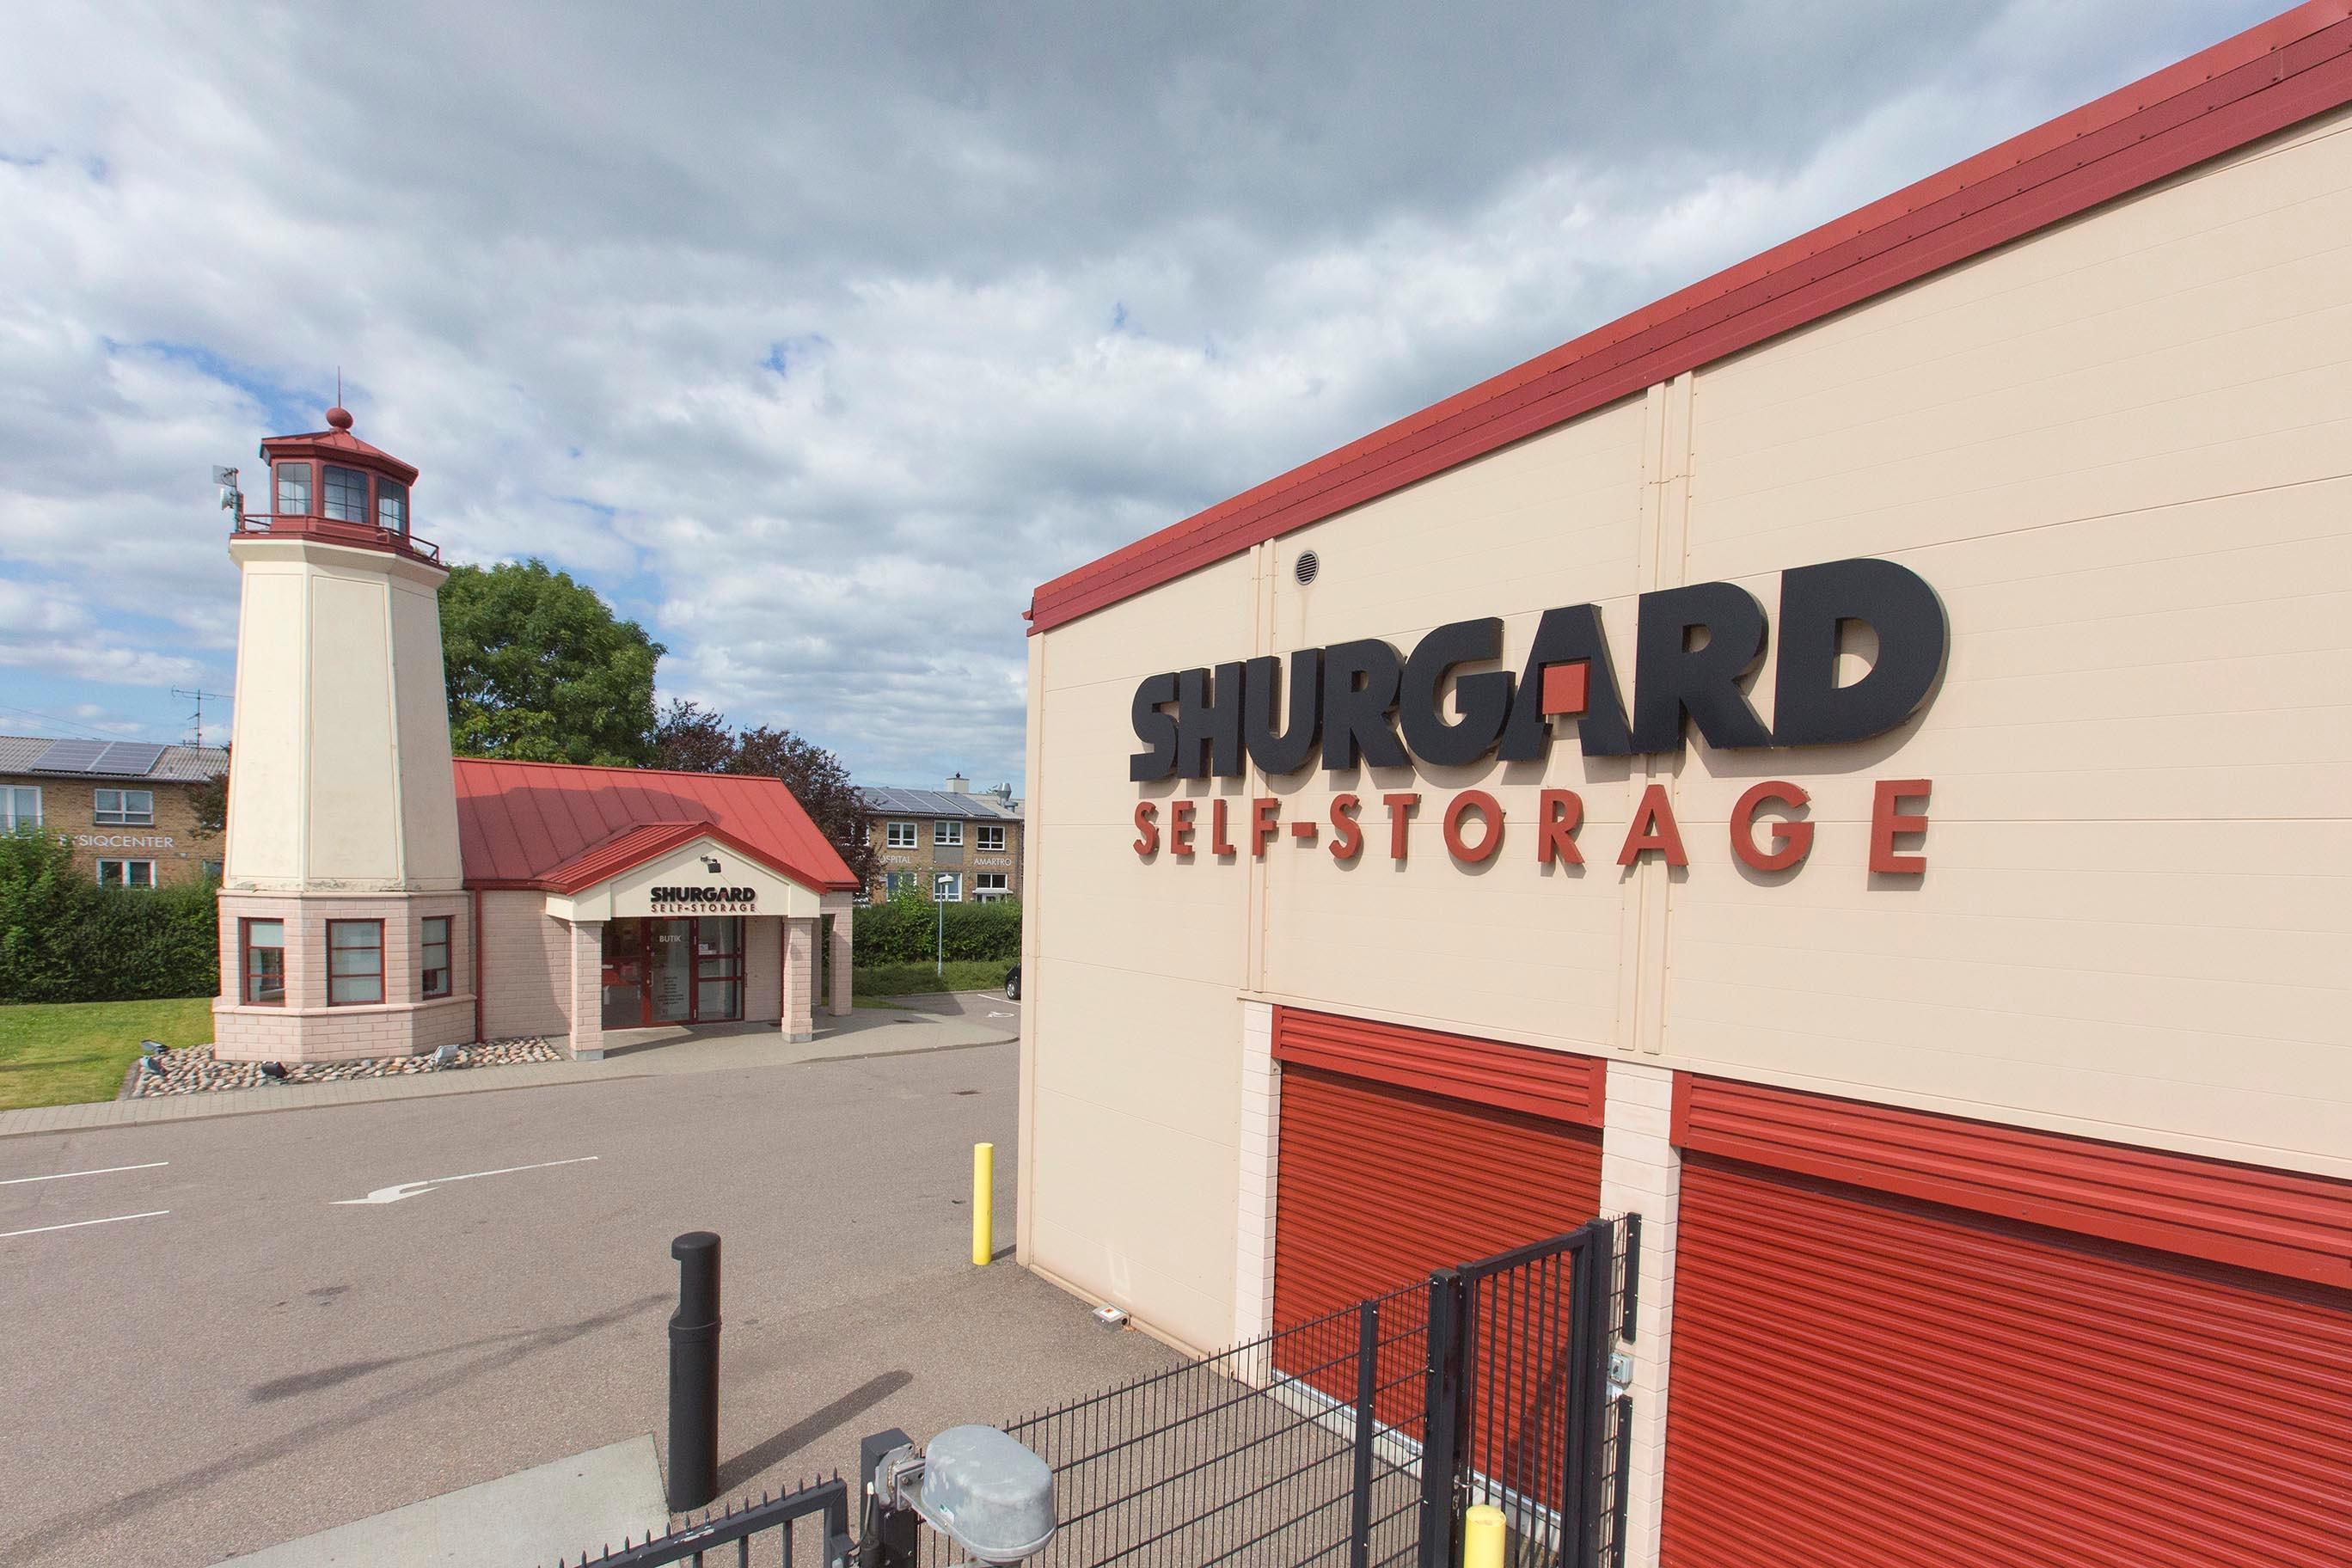 Shurgard Self-Storage Tårnby - Amager